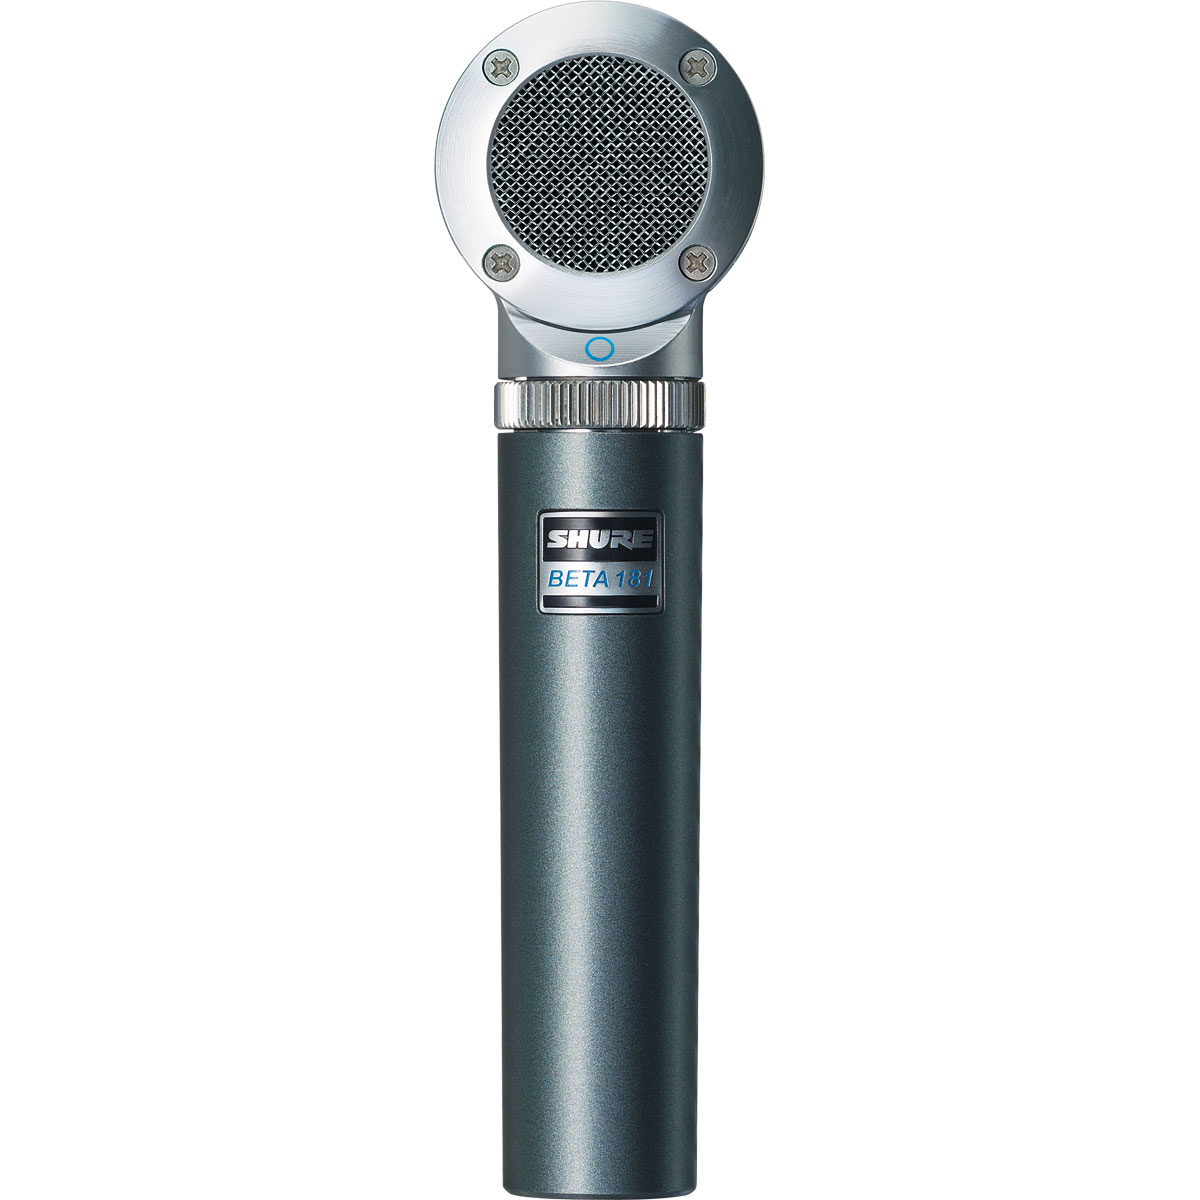 Micros chant - Shure - BETA181-O